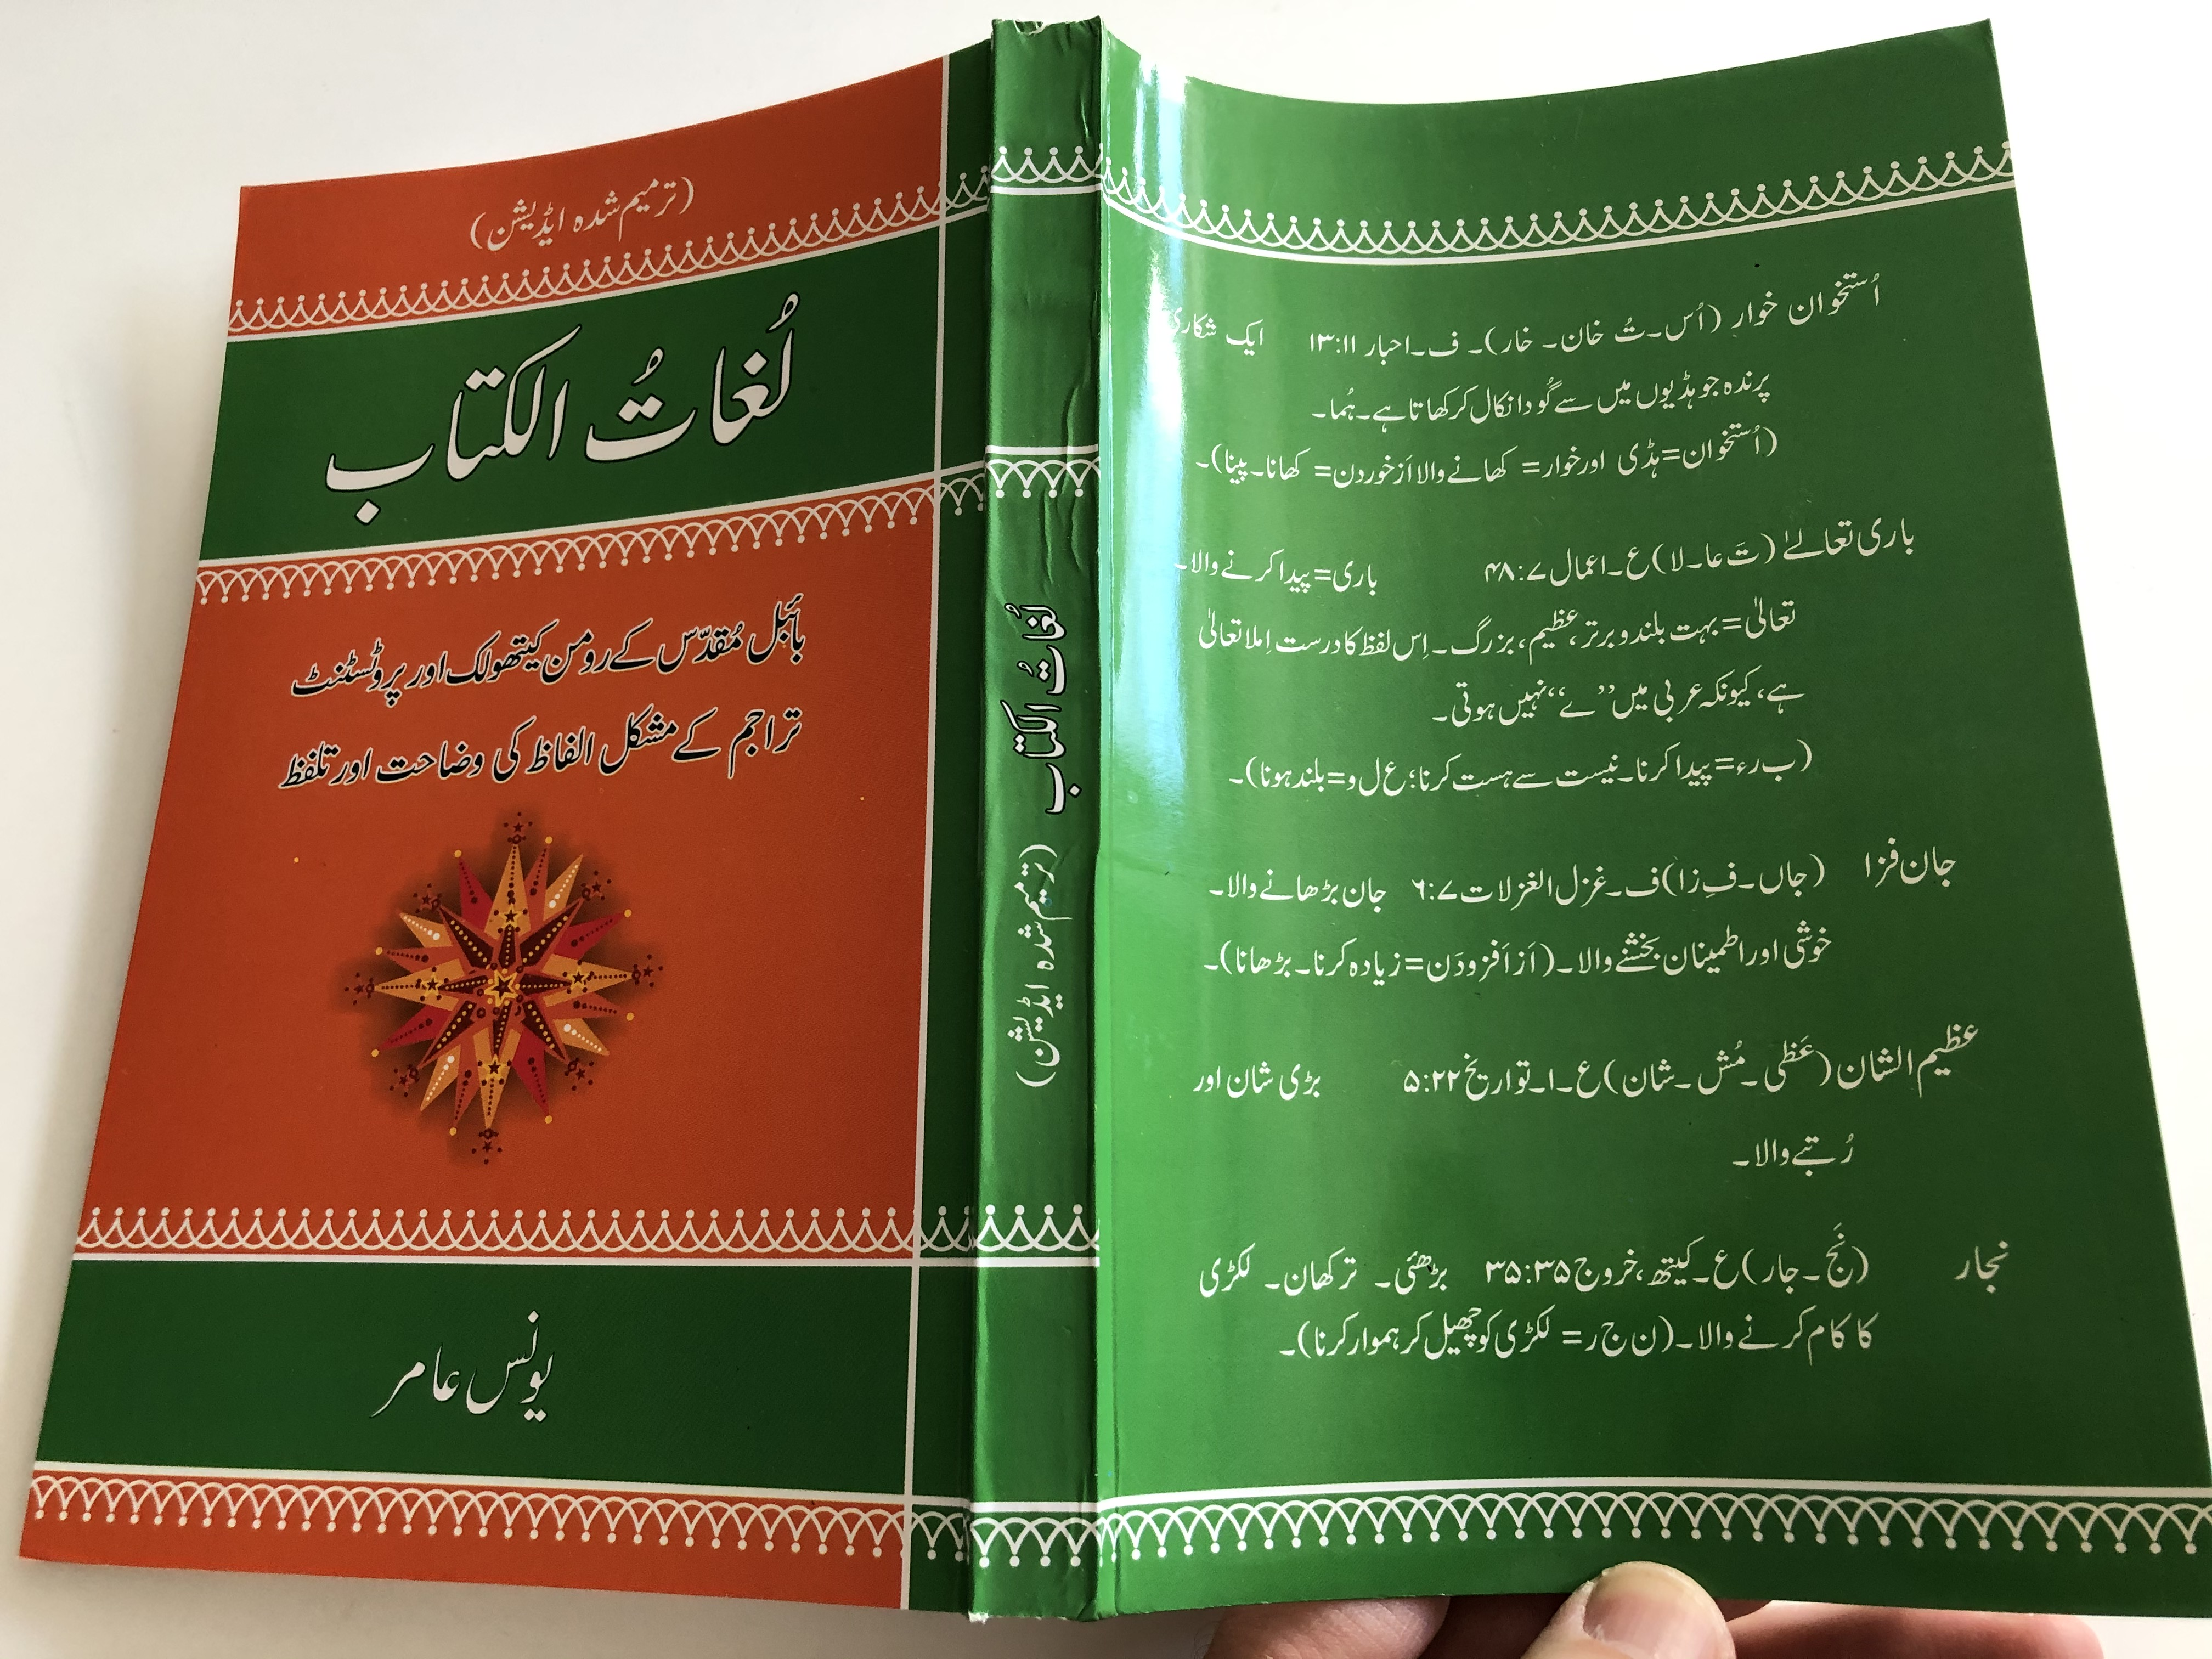 -dictionary-of-difficult-urdu-bible-words-by-younus-aamir-paperback-11-.jpg